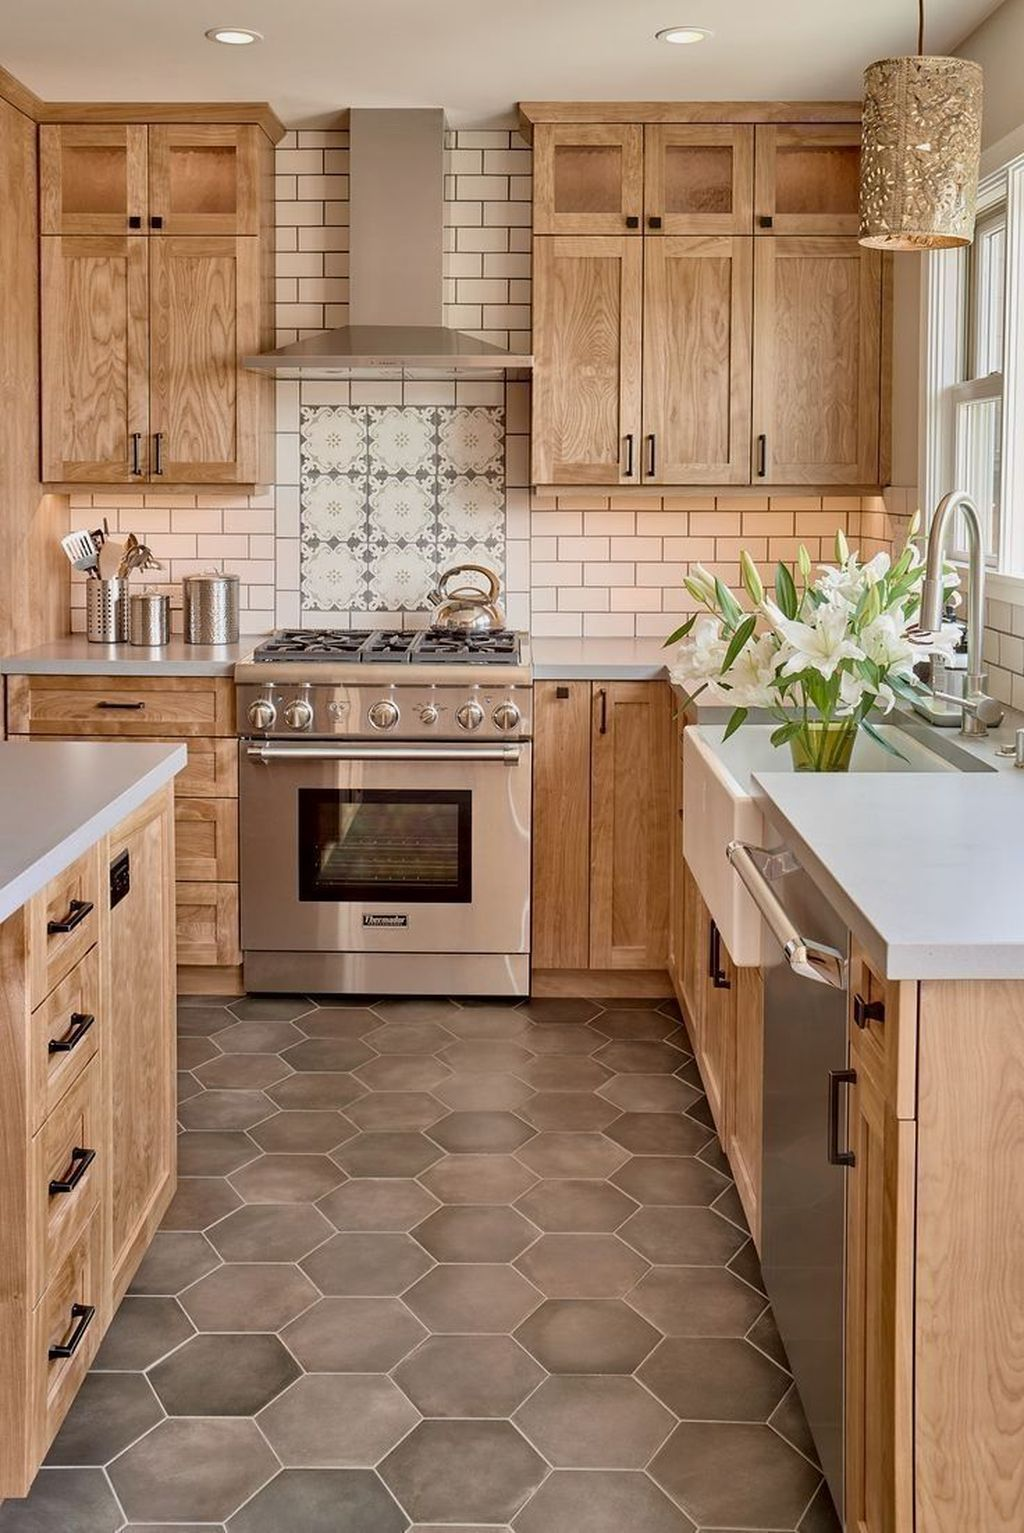 The Best Farmhouse Kitchen Decor Ideas 01